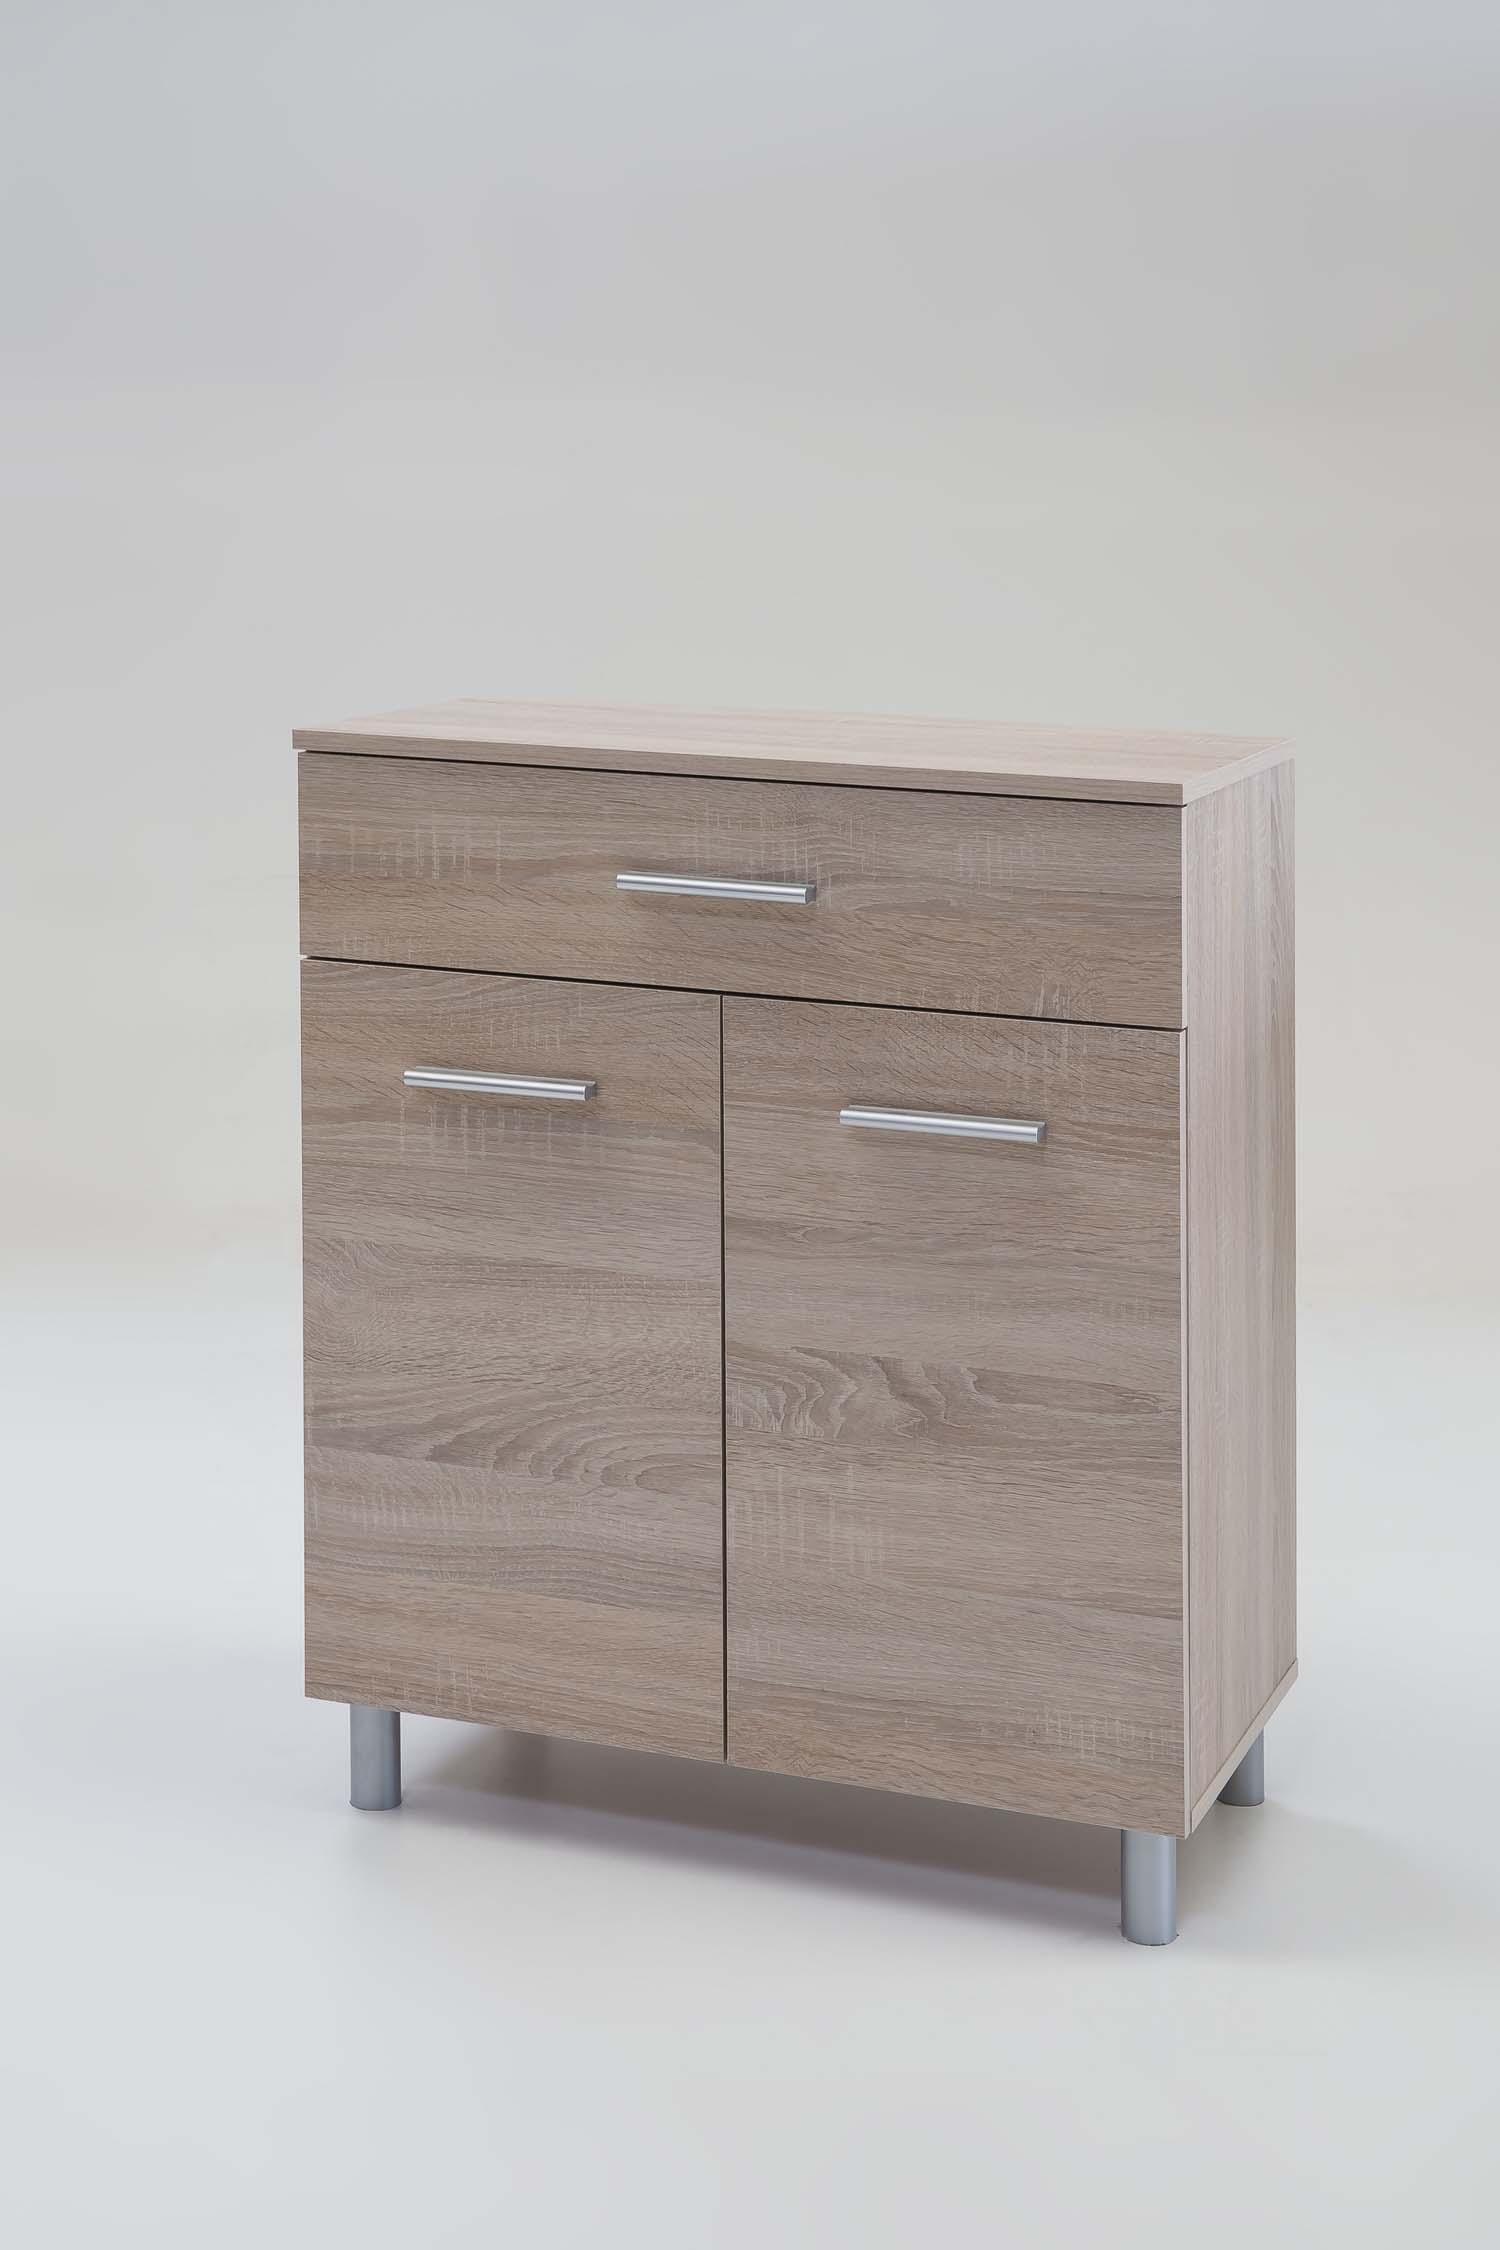 schuhschrank holz weiss garderobenschrank schrank. Black Bedroom Furniture Sets. Home Design Ideas